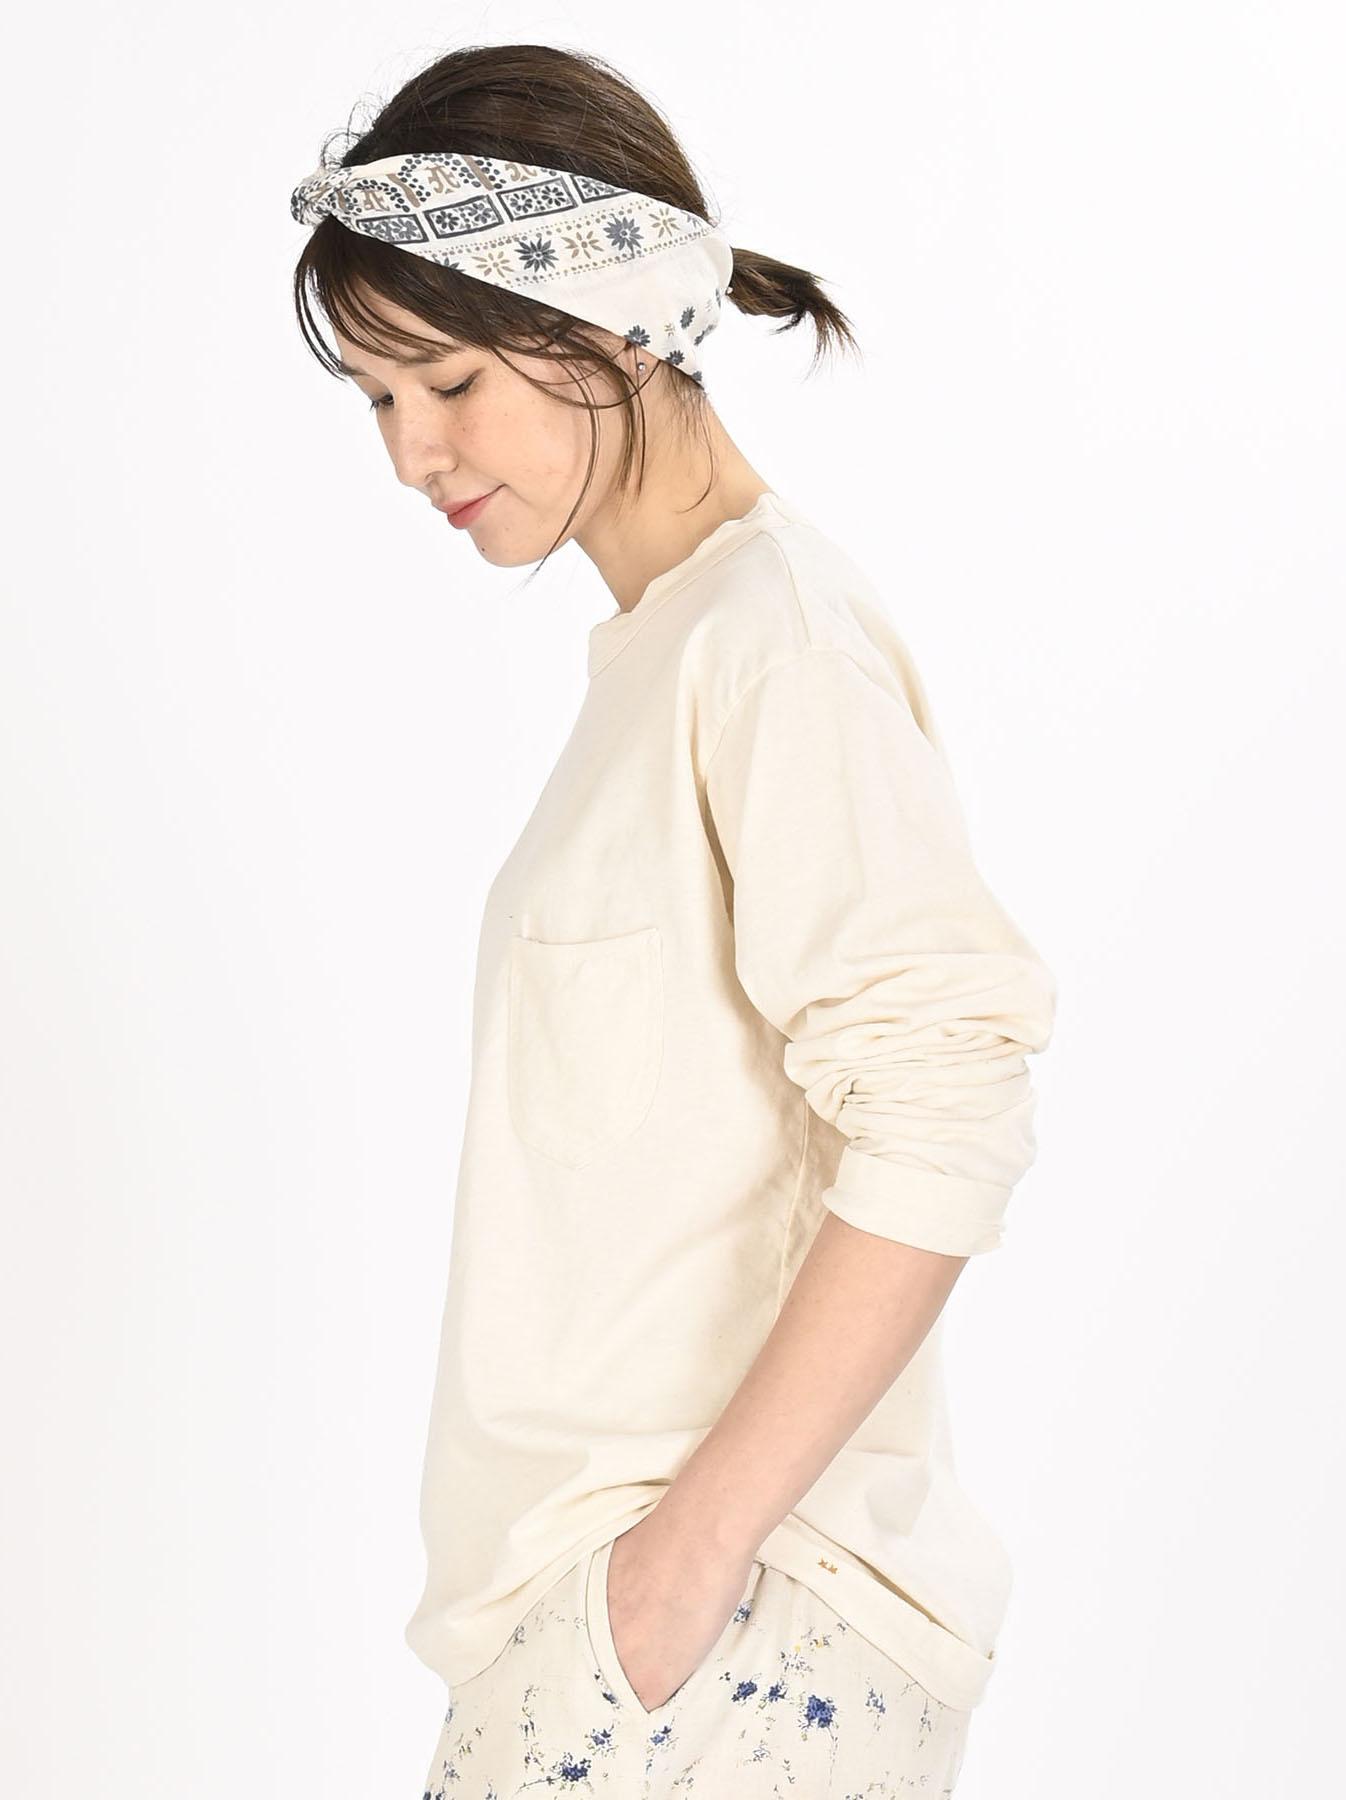 Zimbabwe Cotton 908 Ocean Long-sleeved T-shirt-8